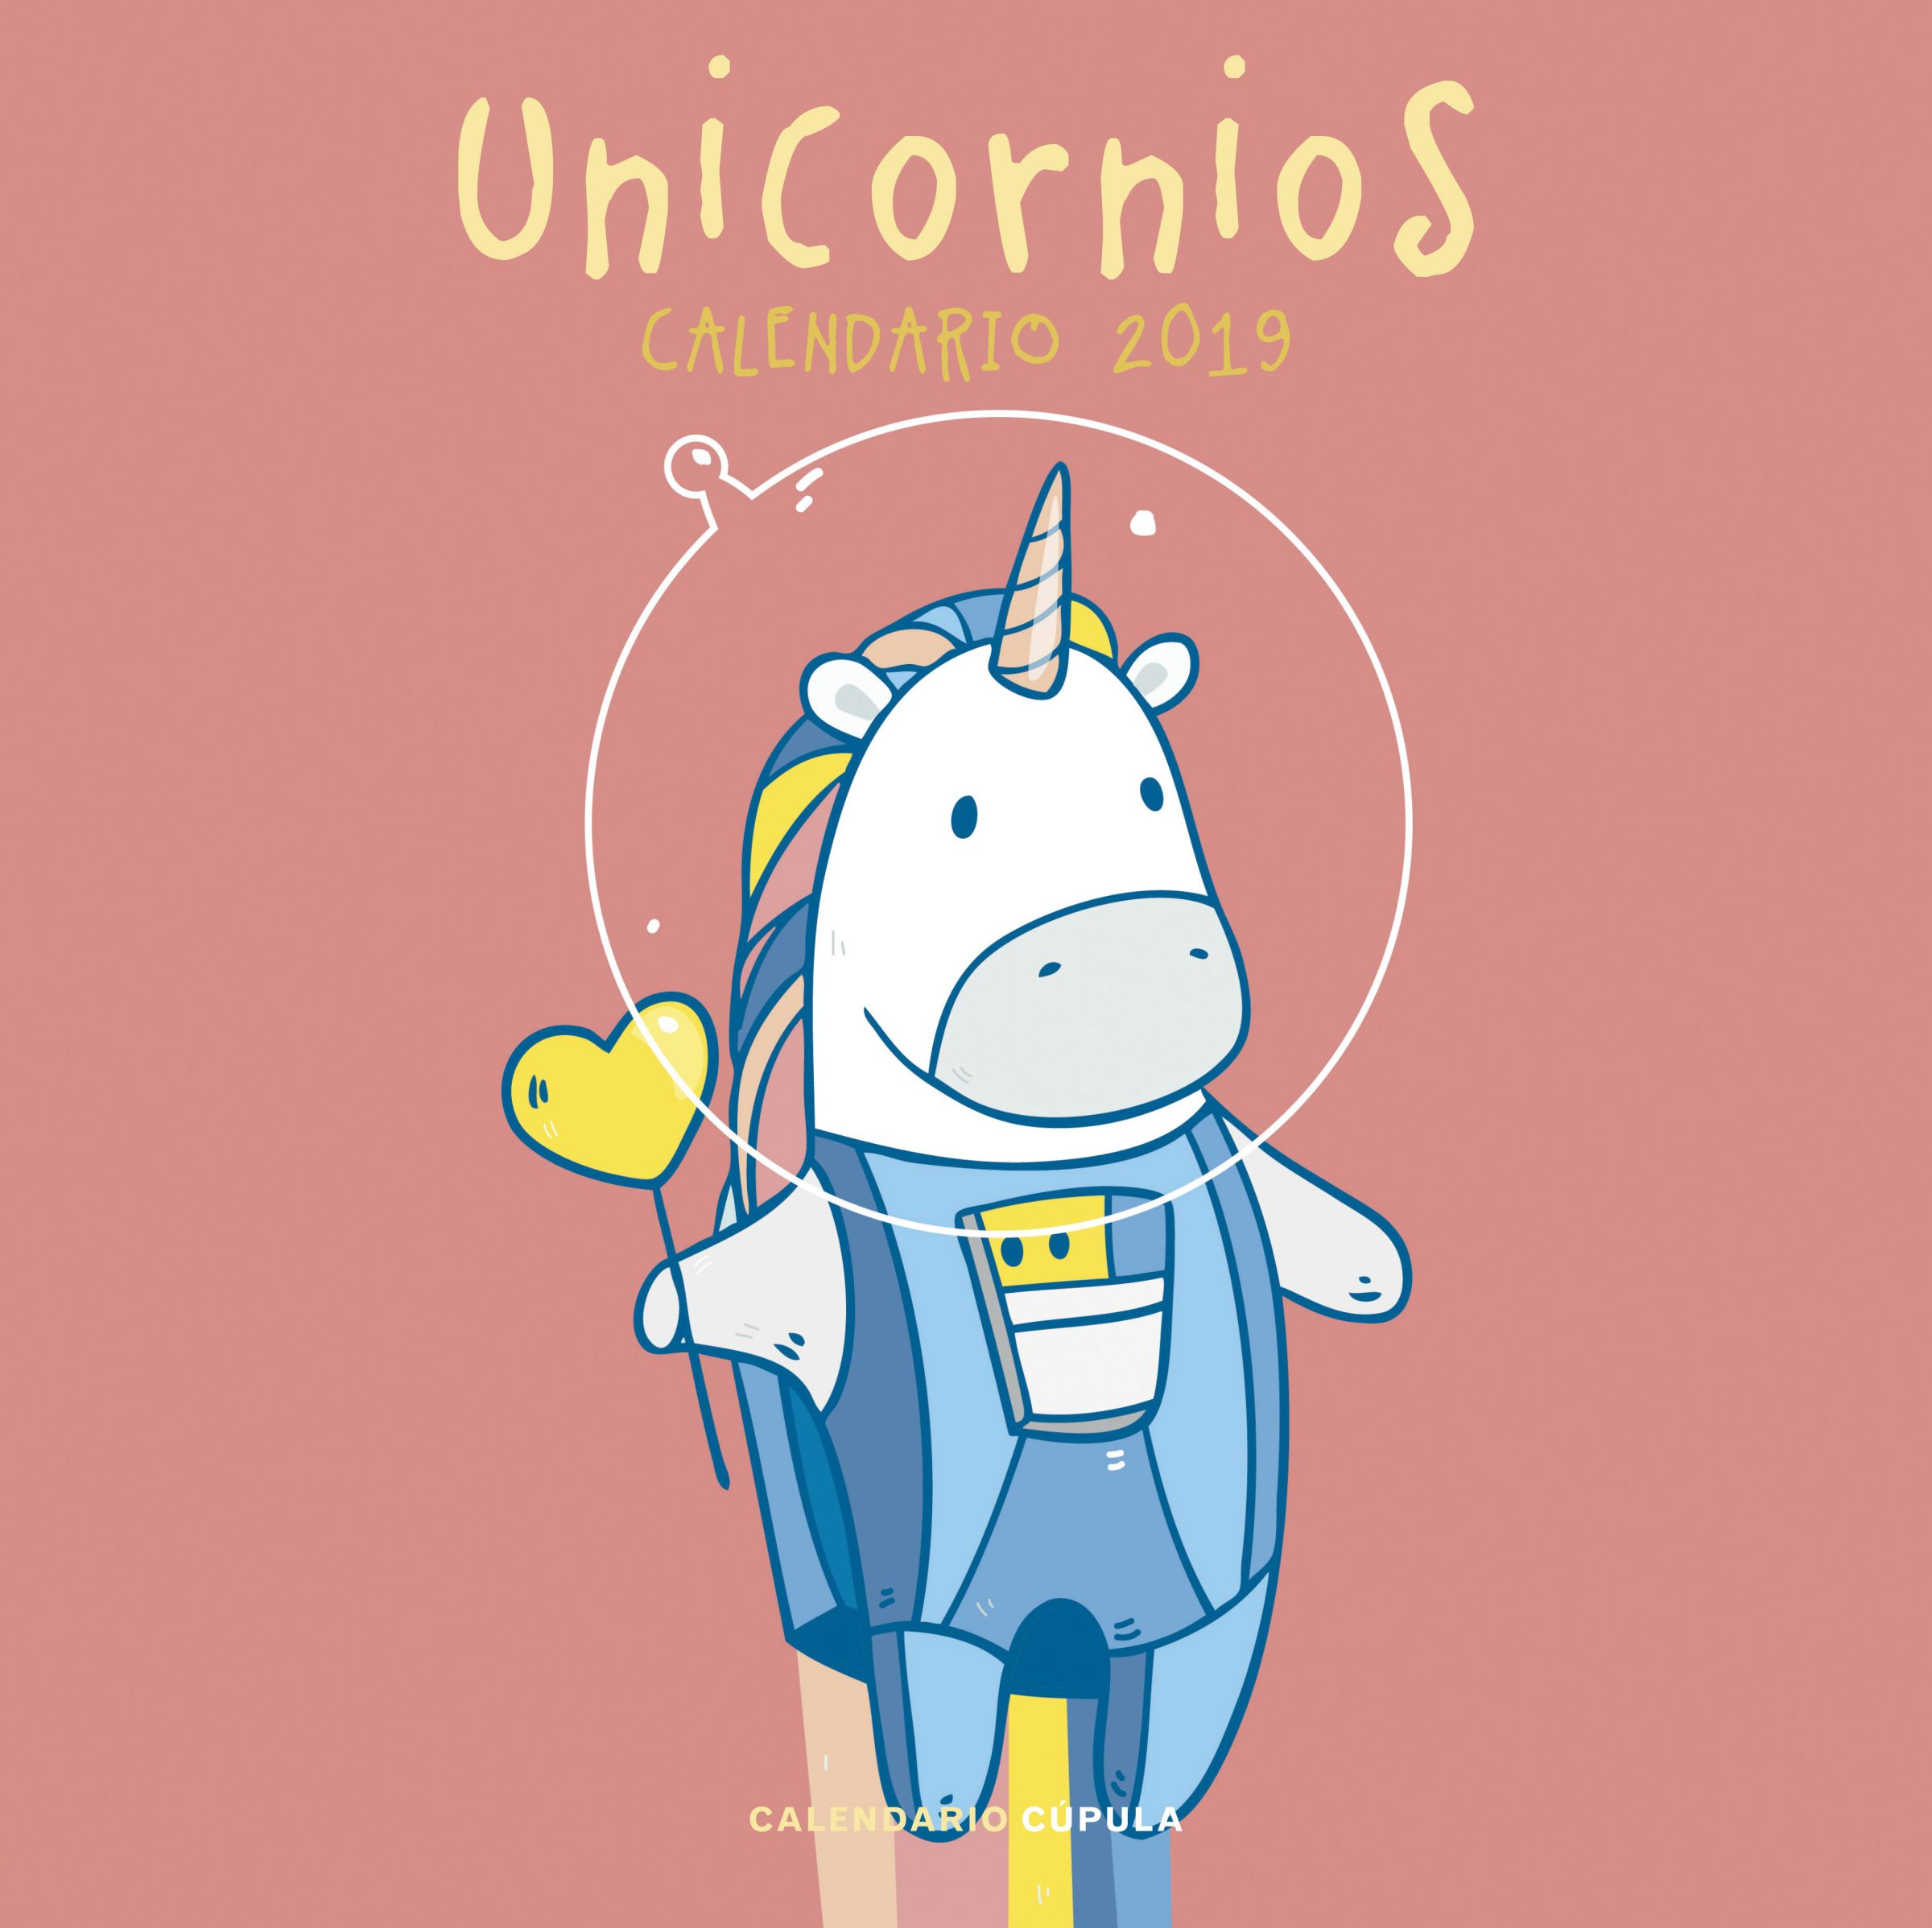 calendario unicornios 2019-9788448024758